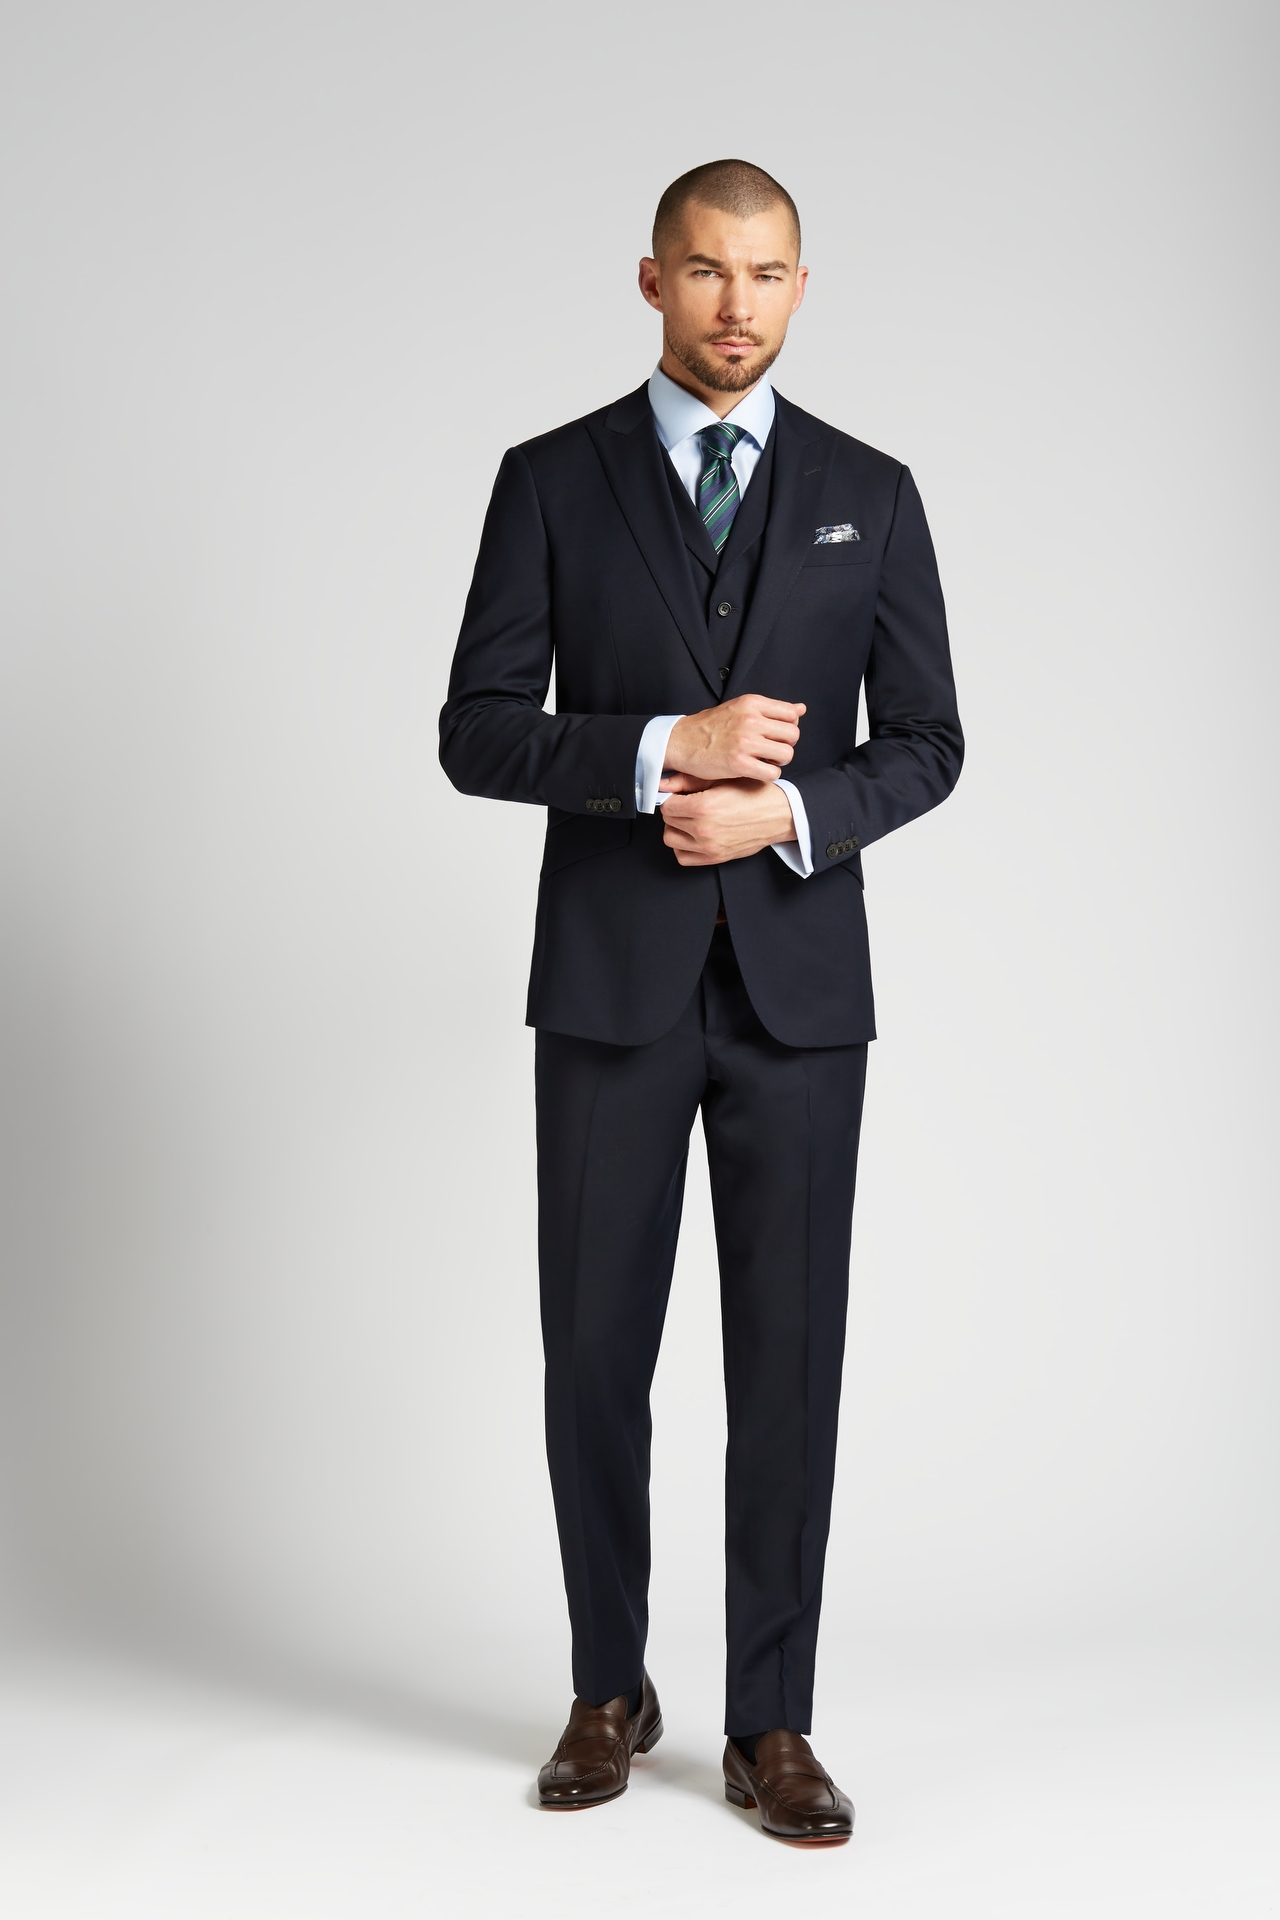 e6900dc20178be August McGregor Slim-fit 4-Season Wool 3-Piece Suit in Midnight Navy ...